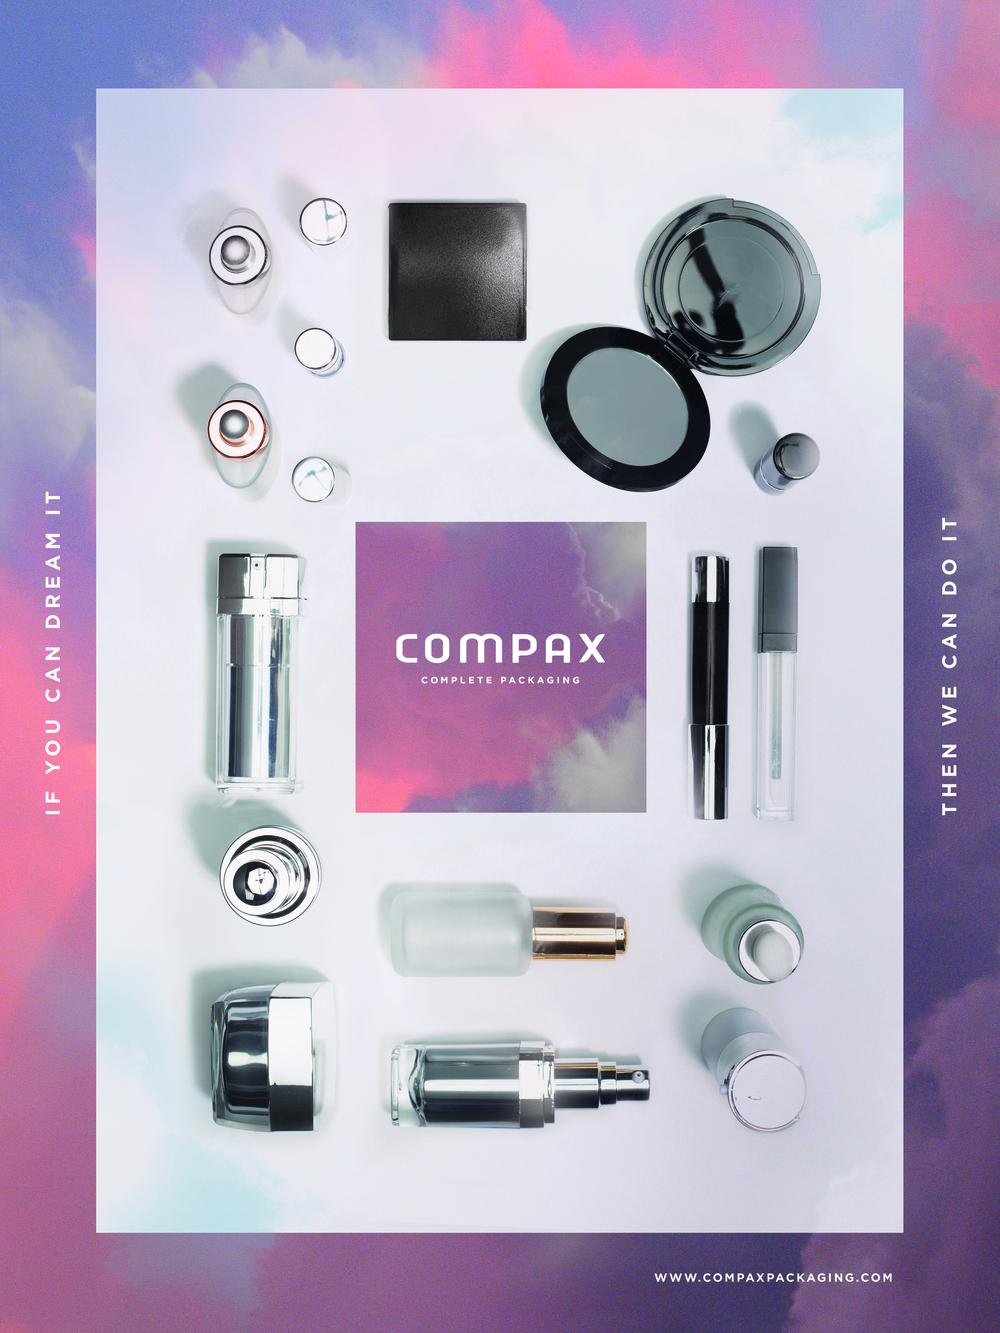 compax_concept_brandad_01b.jpg